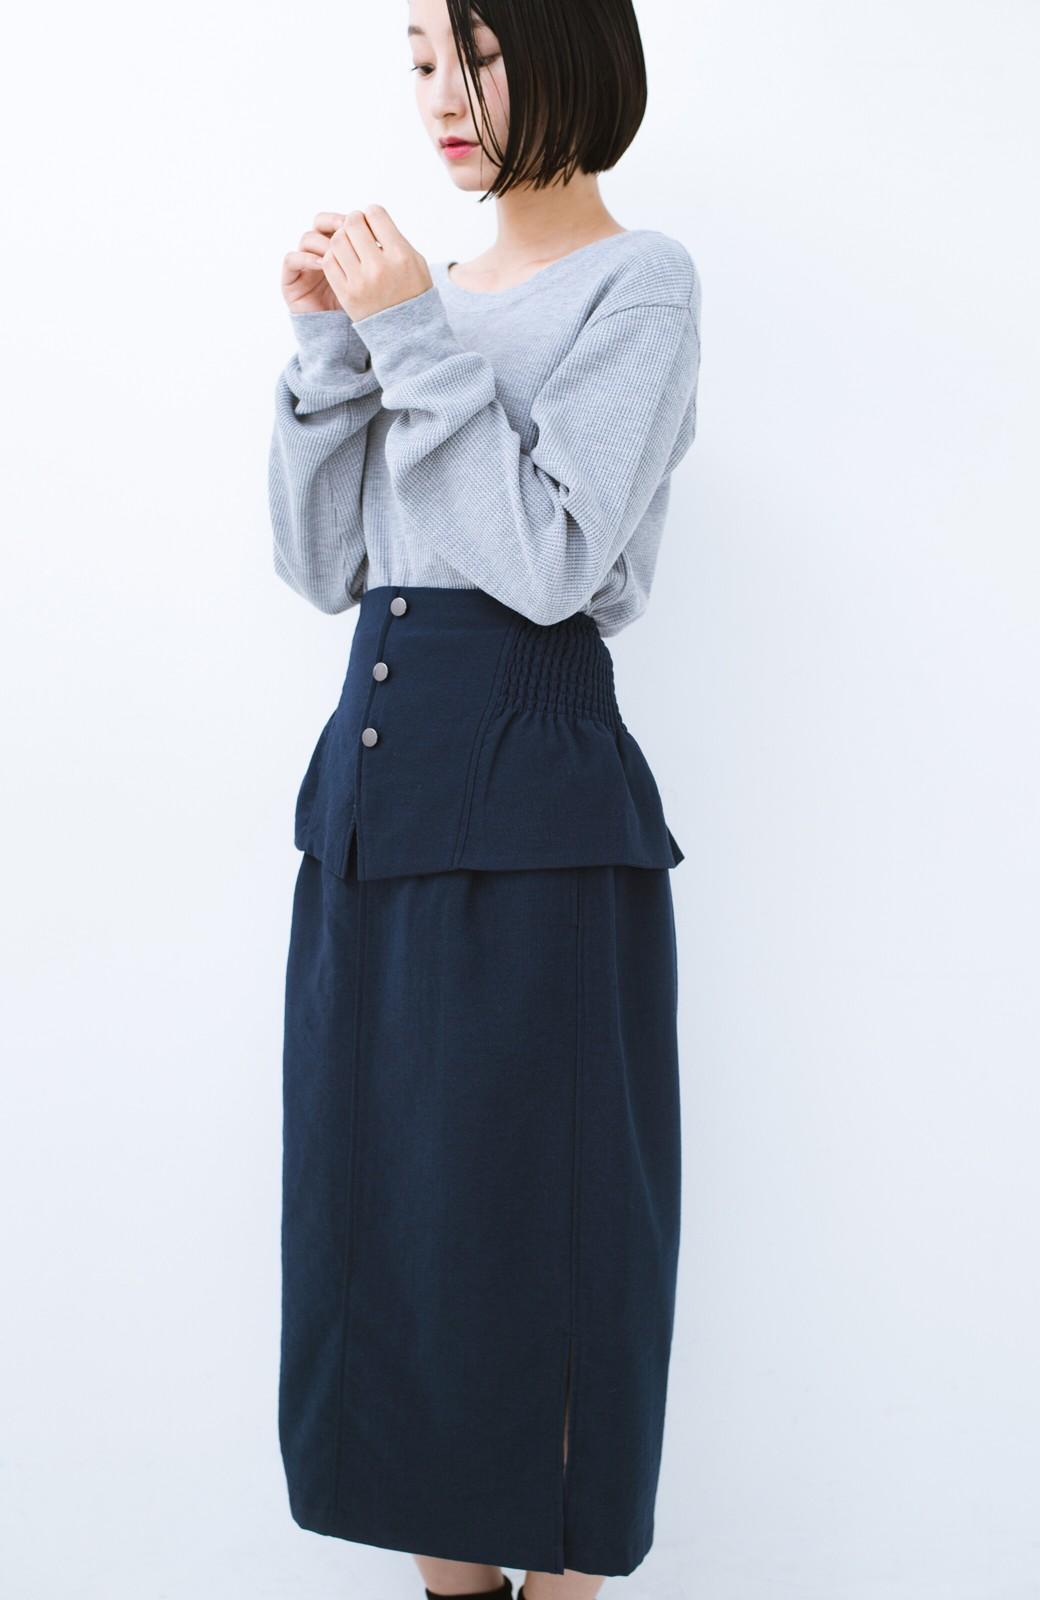 haco!  腹巻きとは呼ばせない ブルー期も華やかに過ごせる消臭加工裏地付きフリルデザインスカートセット【ブルー期】女の子バンザイ!プロジェクト <ネイビー>の商品写真2